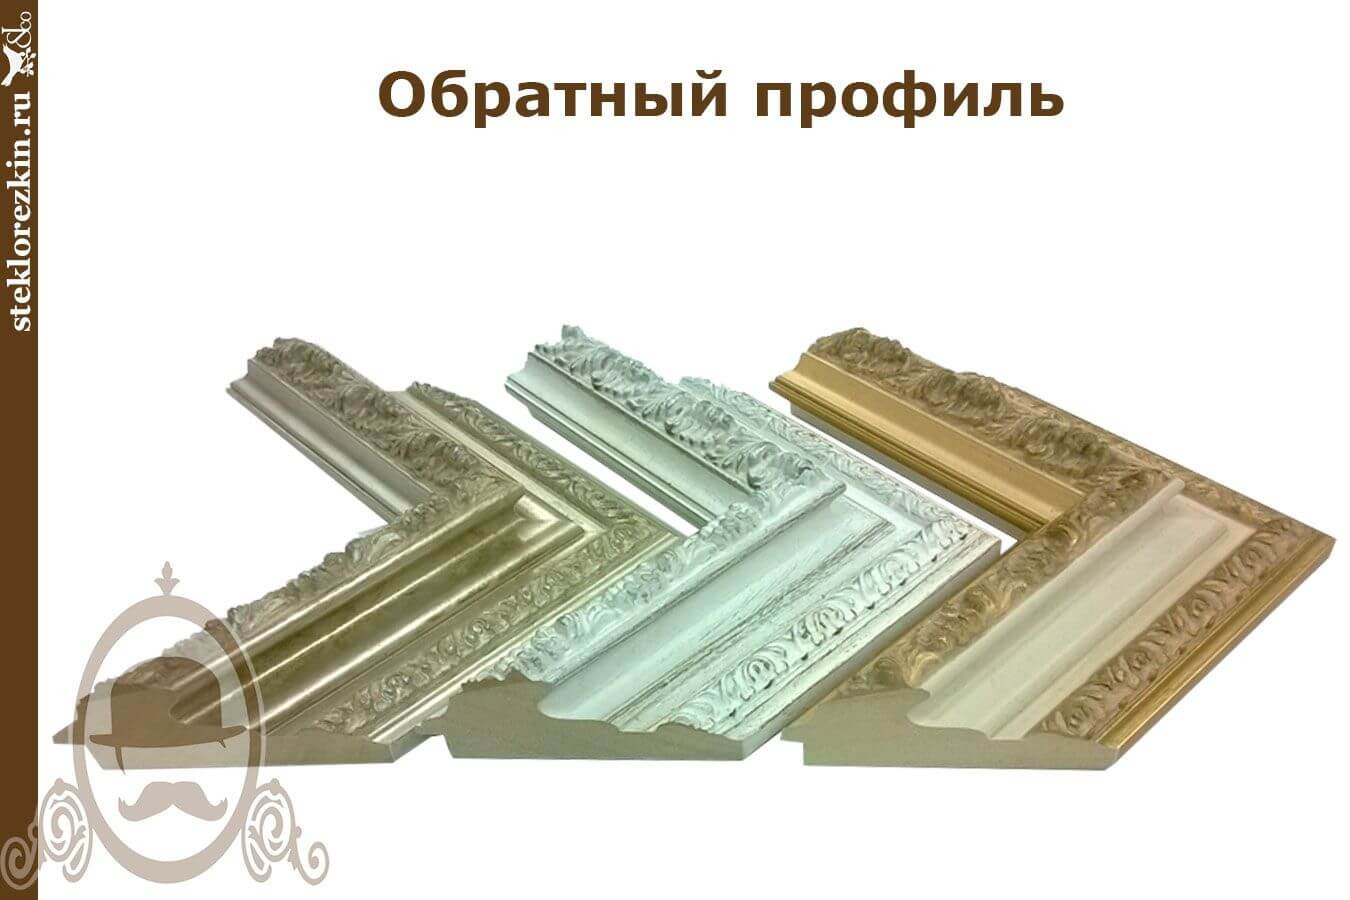 Baget_plastik_steklorezkin.ru_baget-obra